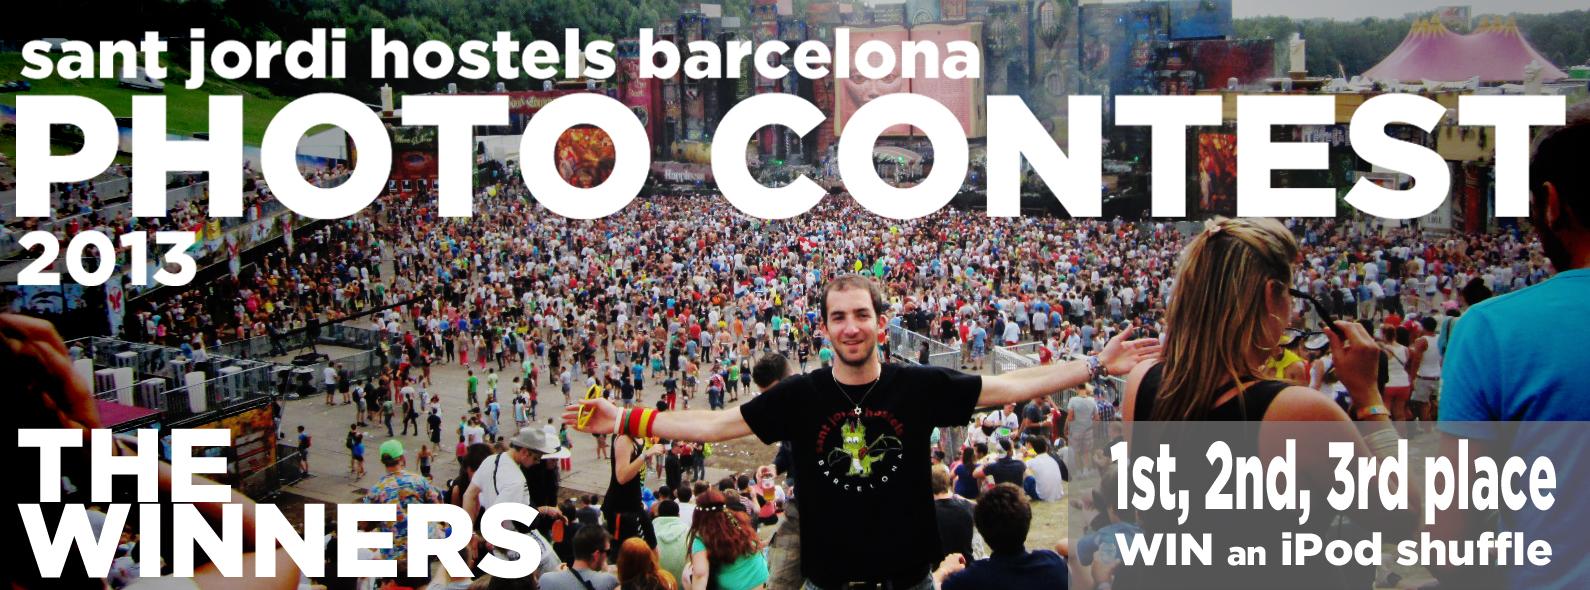 sant jordi hostels barcelona photo contest winners 2013_4